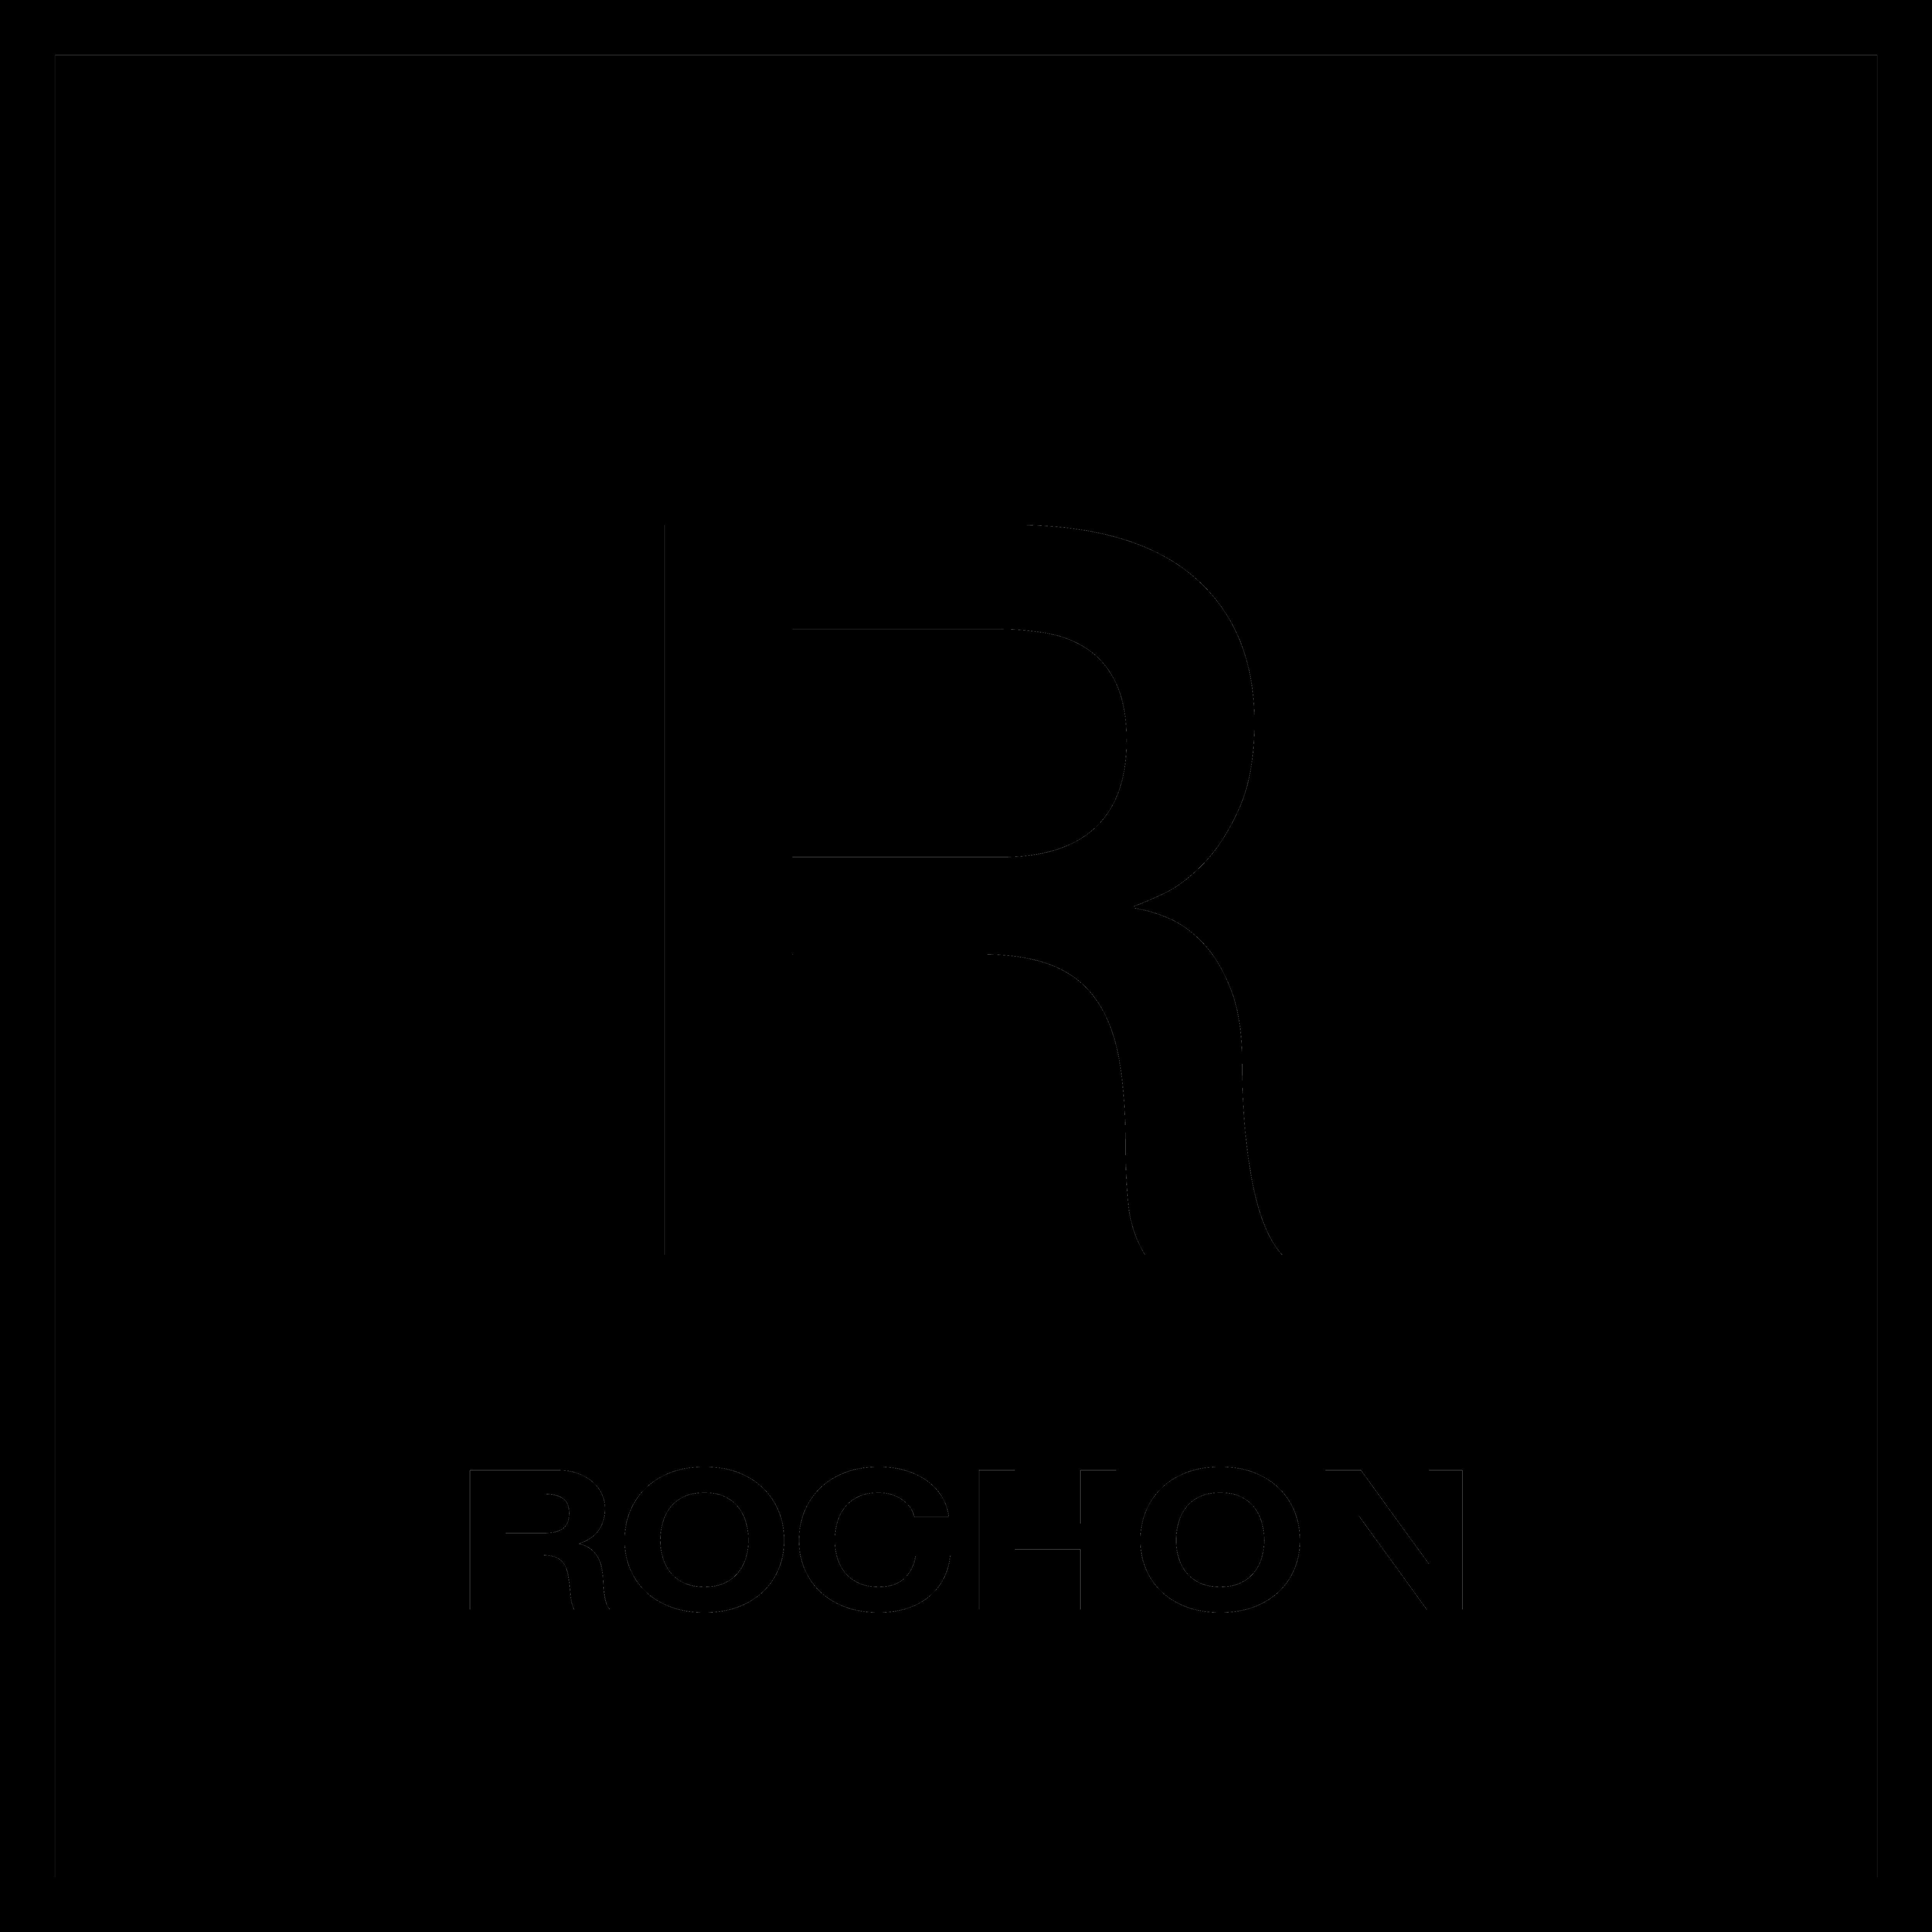 Rochon logo transparent